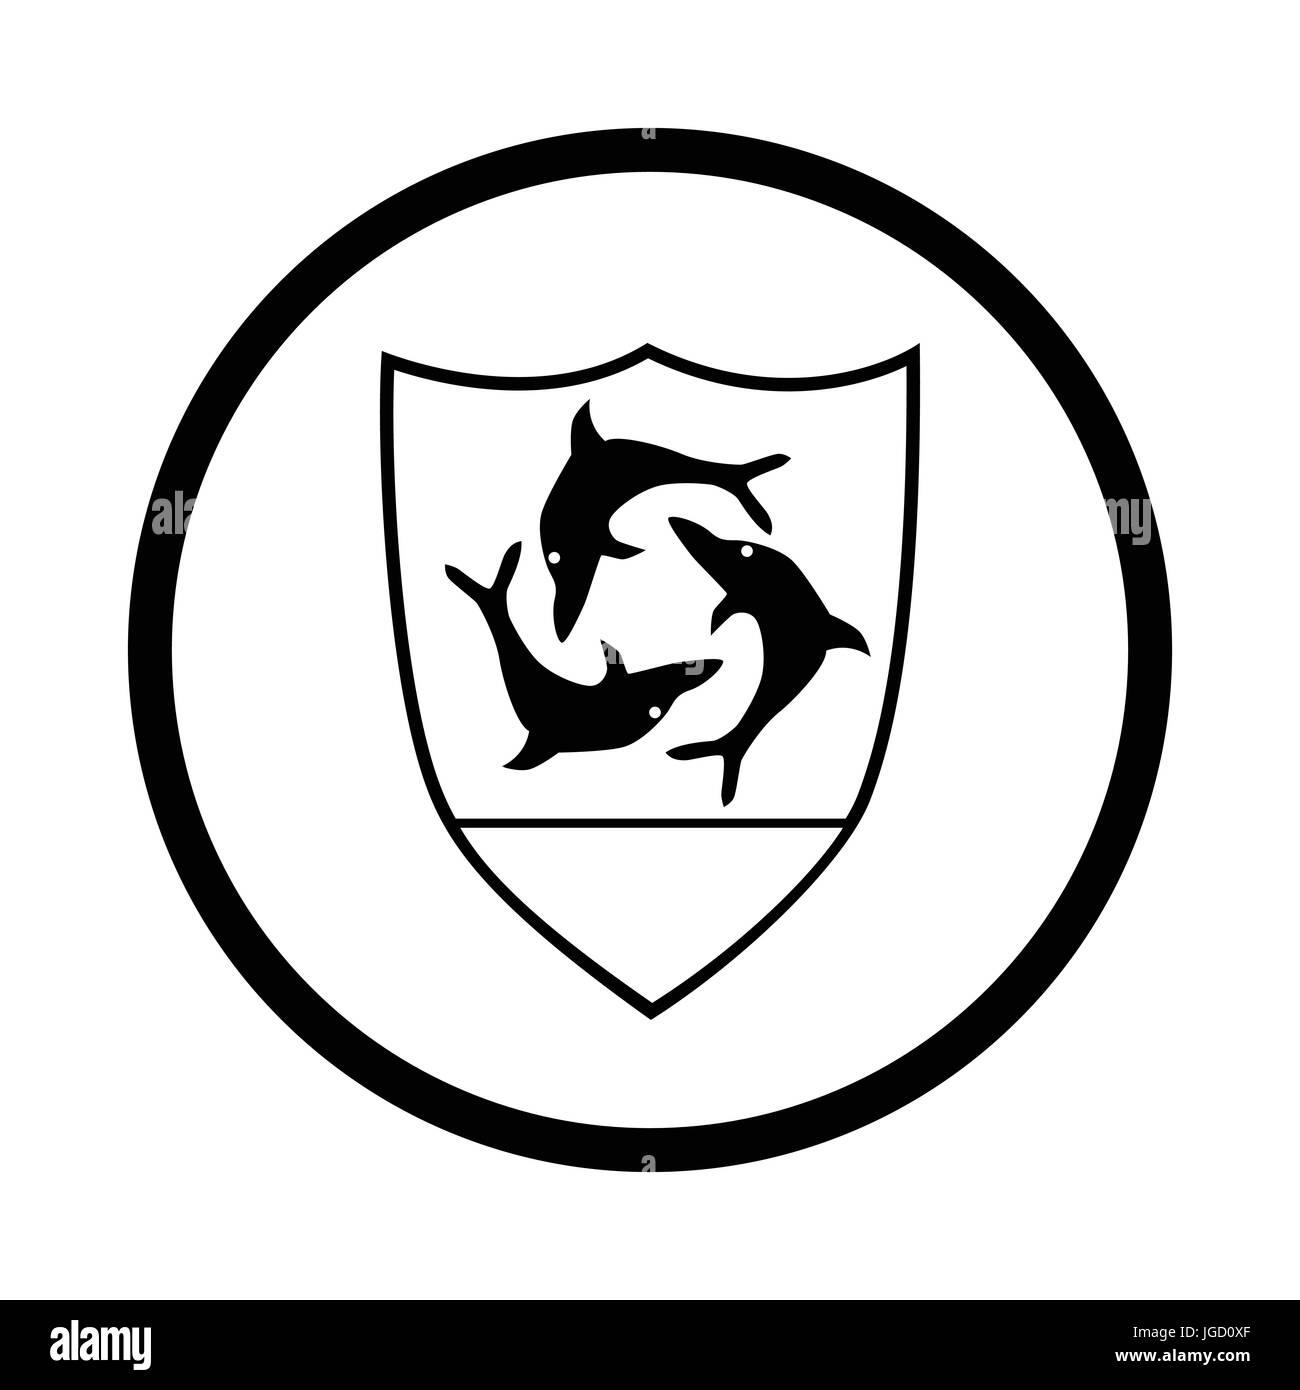 Symbol of Anguilla icon, iconic symbol inside a circle, on white background. Vector Iconic Design. - Stock Image